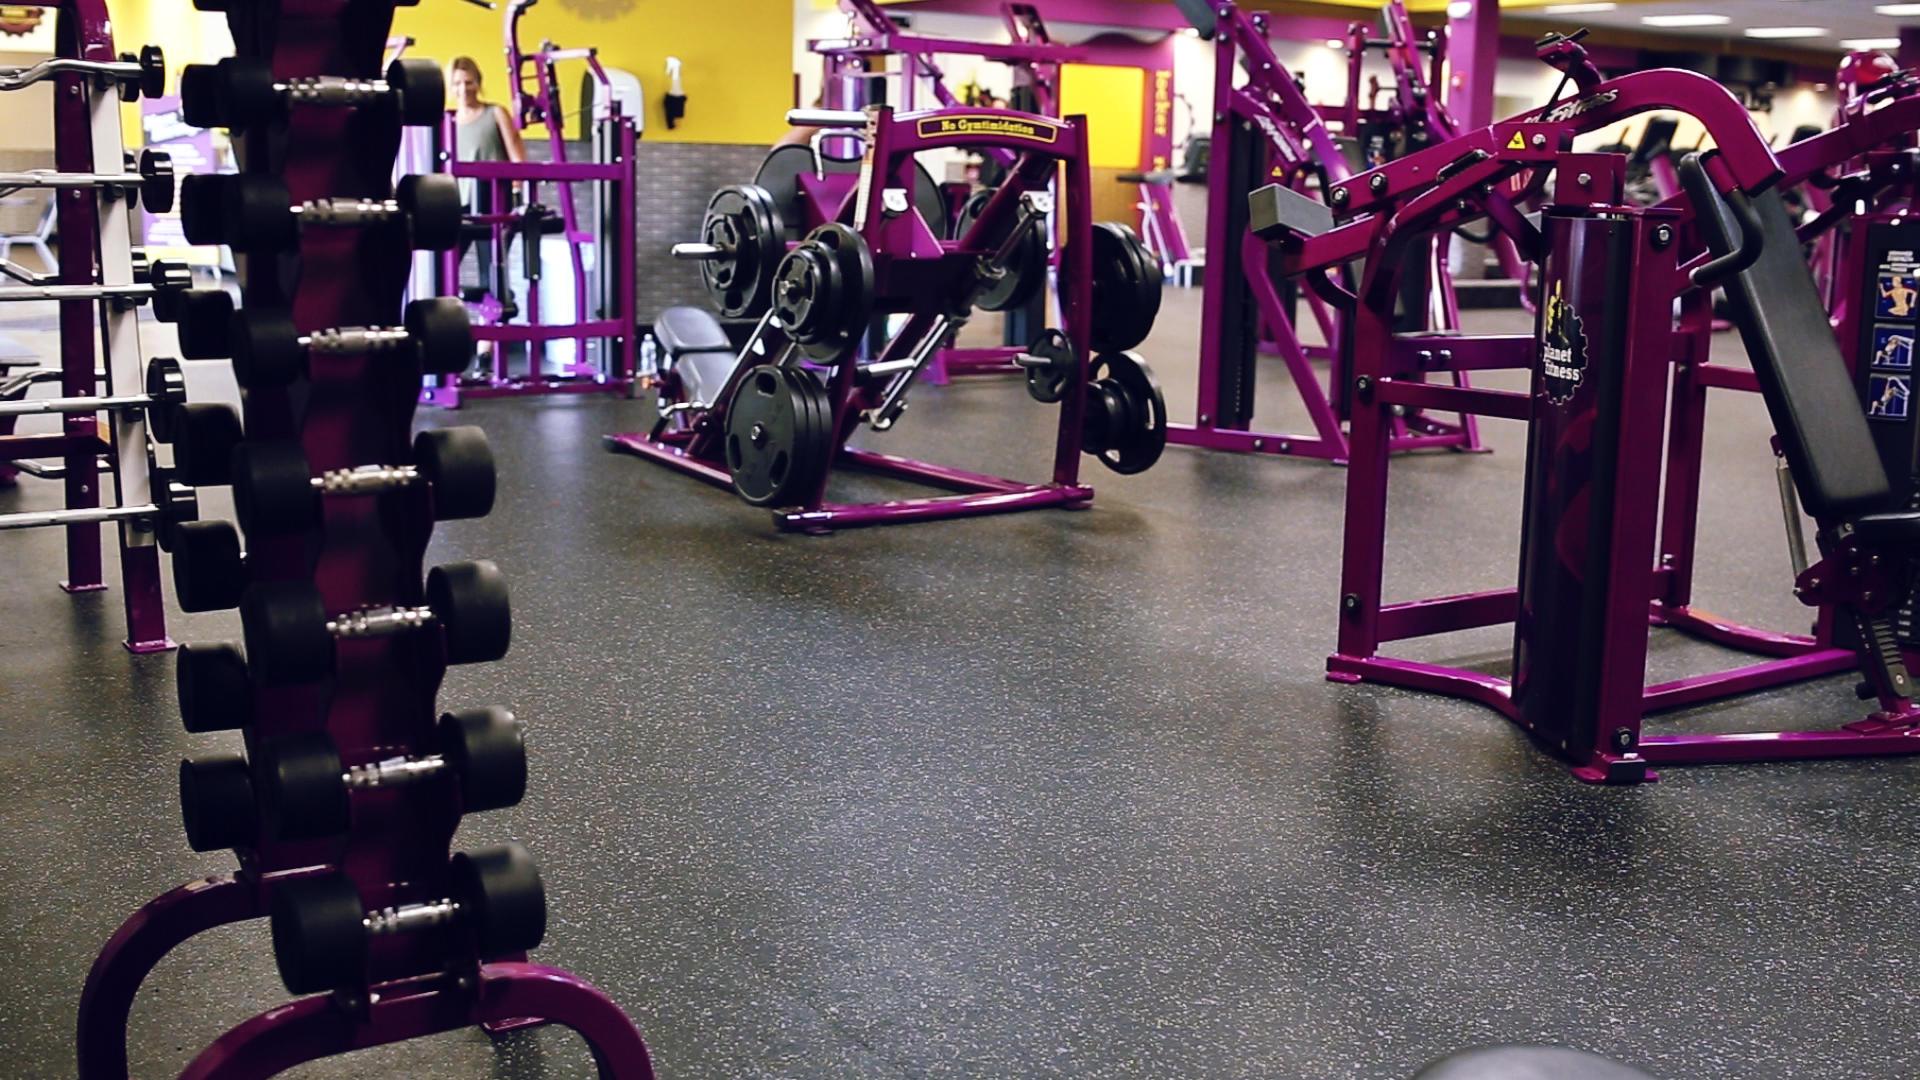 Gym in Plainsboro NJ  10 Schalks Crossing Rd  Planet